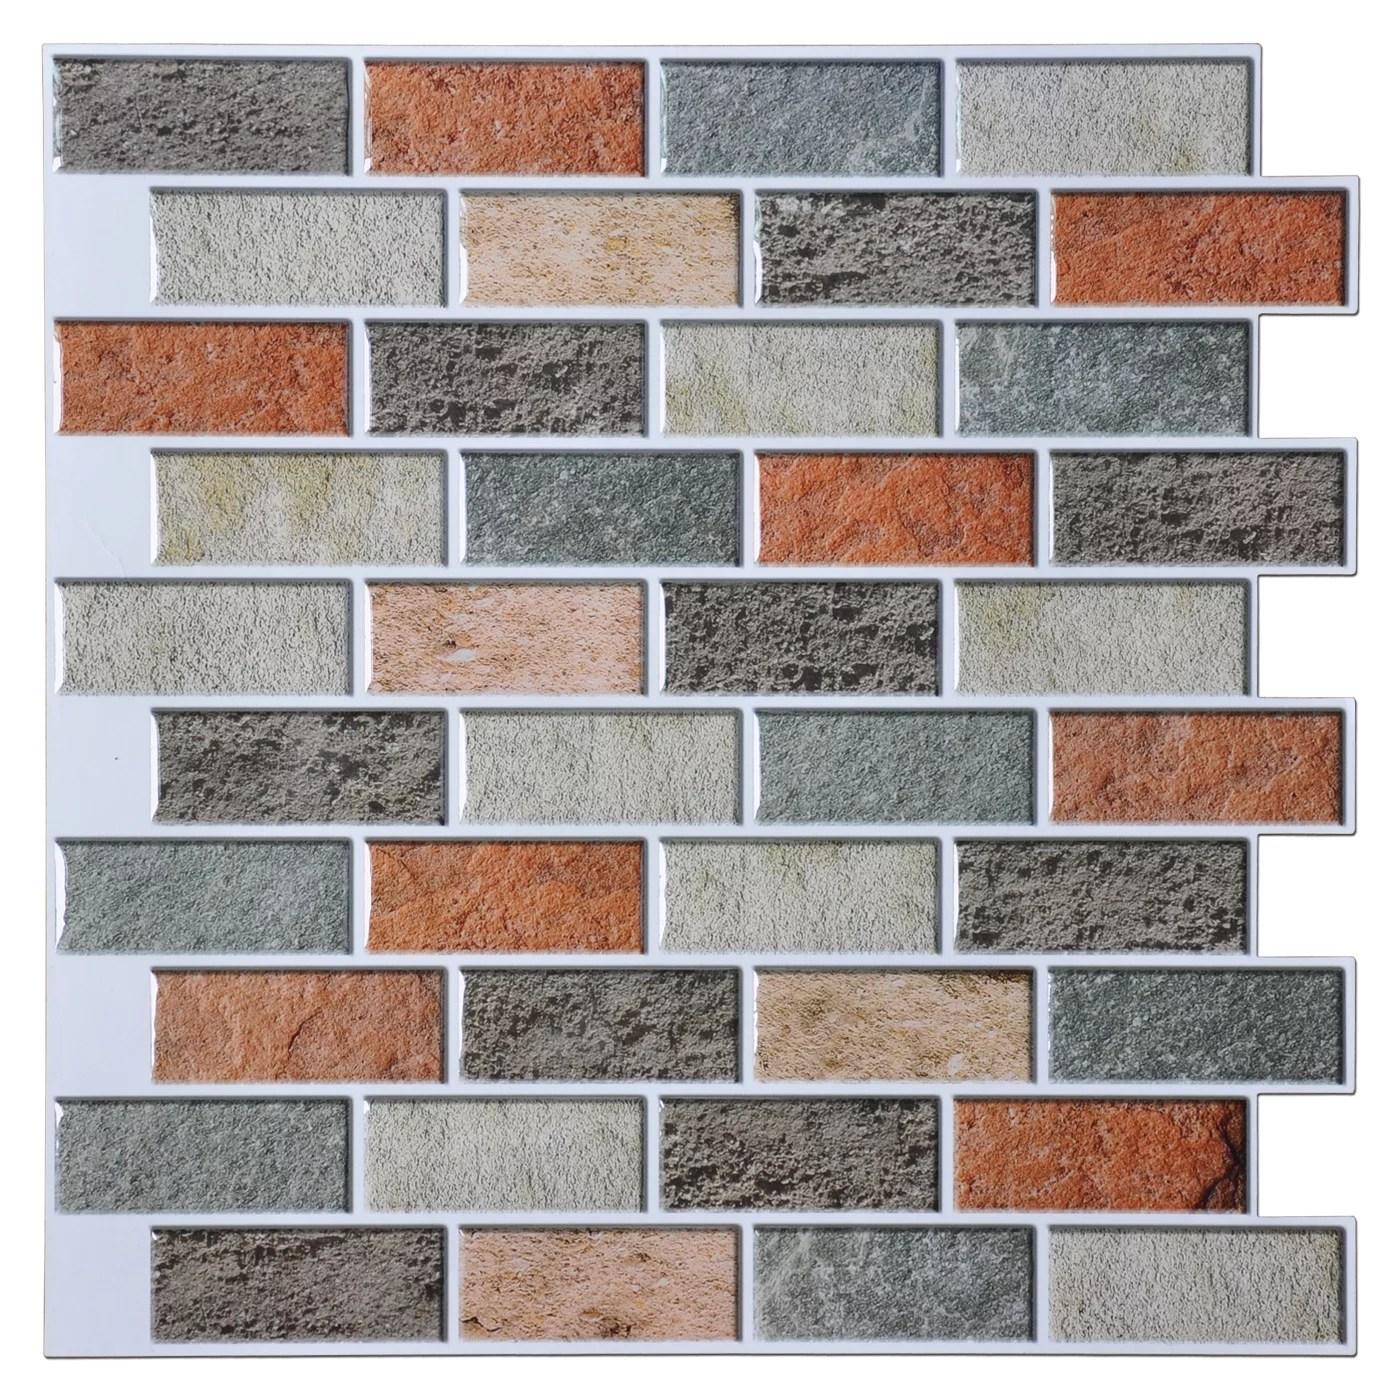 art3d peel and stick kitchen backsplash self adhesive subway tile 12 x12 faux stone mosaic 10 pack walmart com